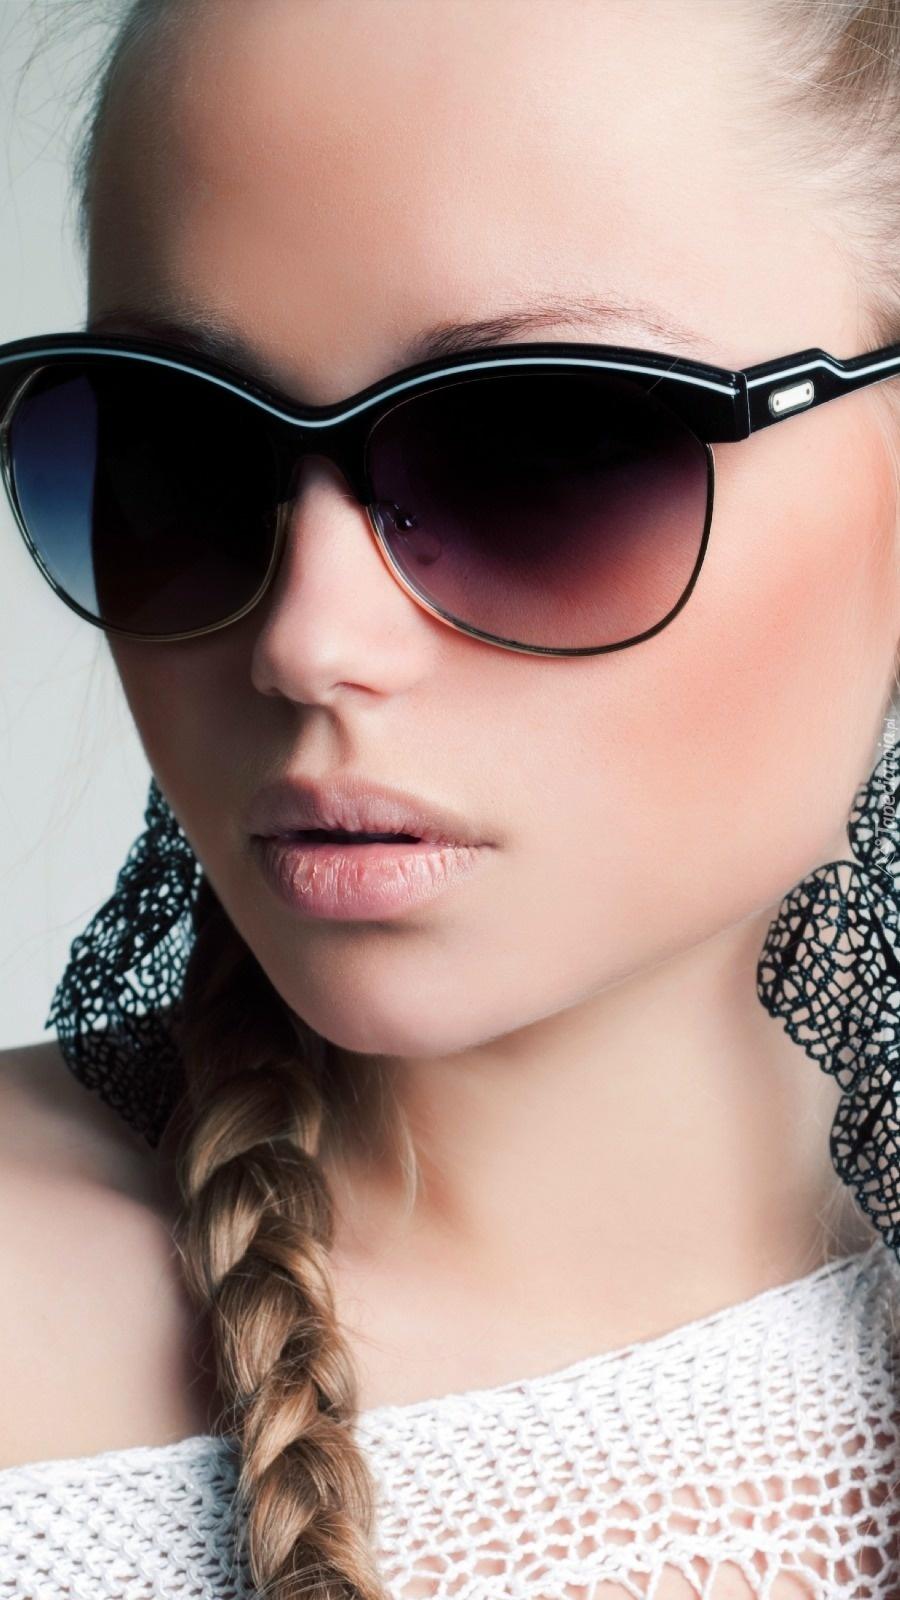 Modelka w okularach